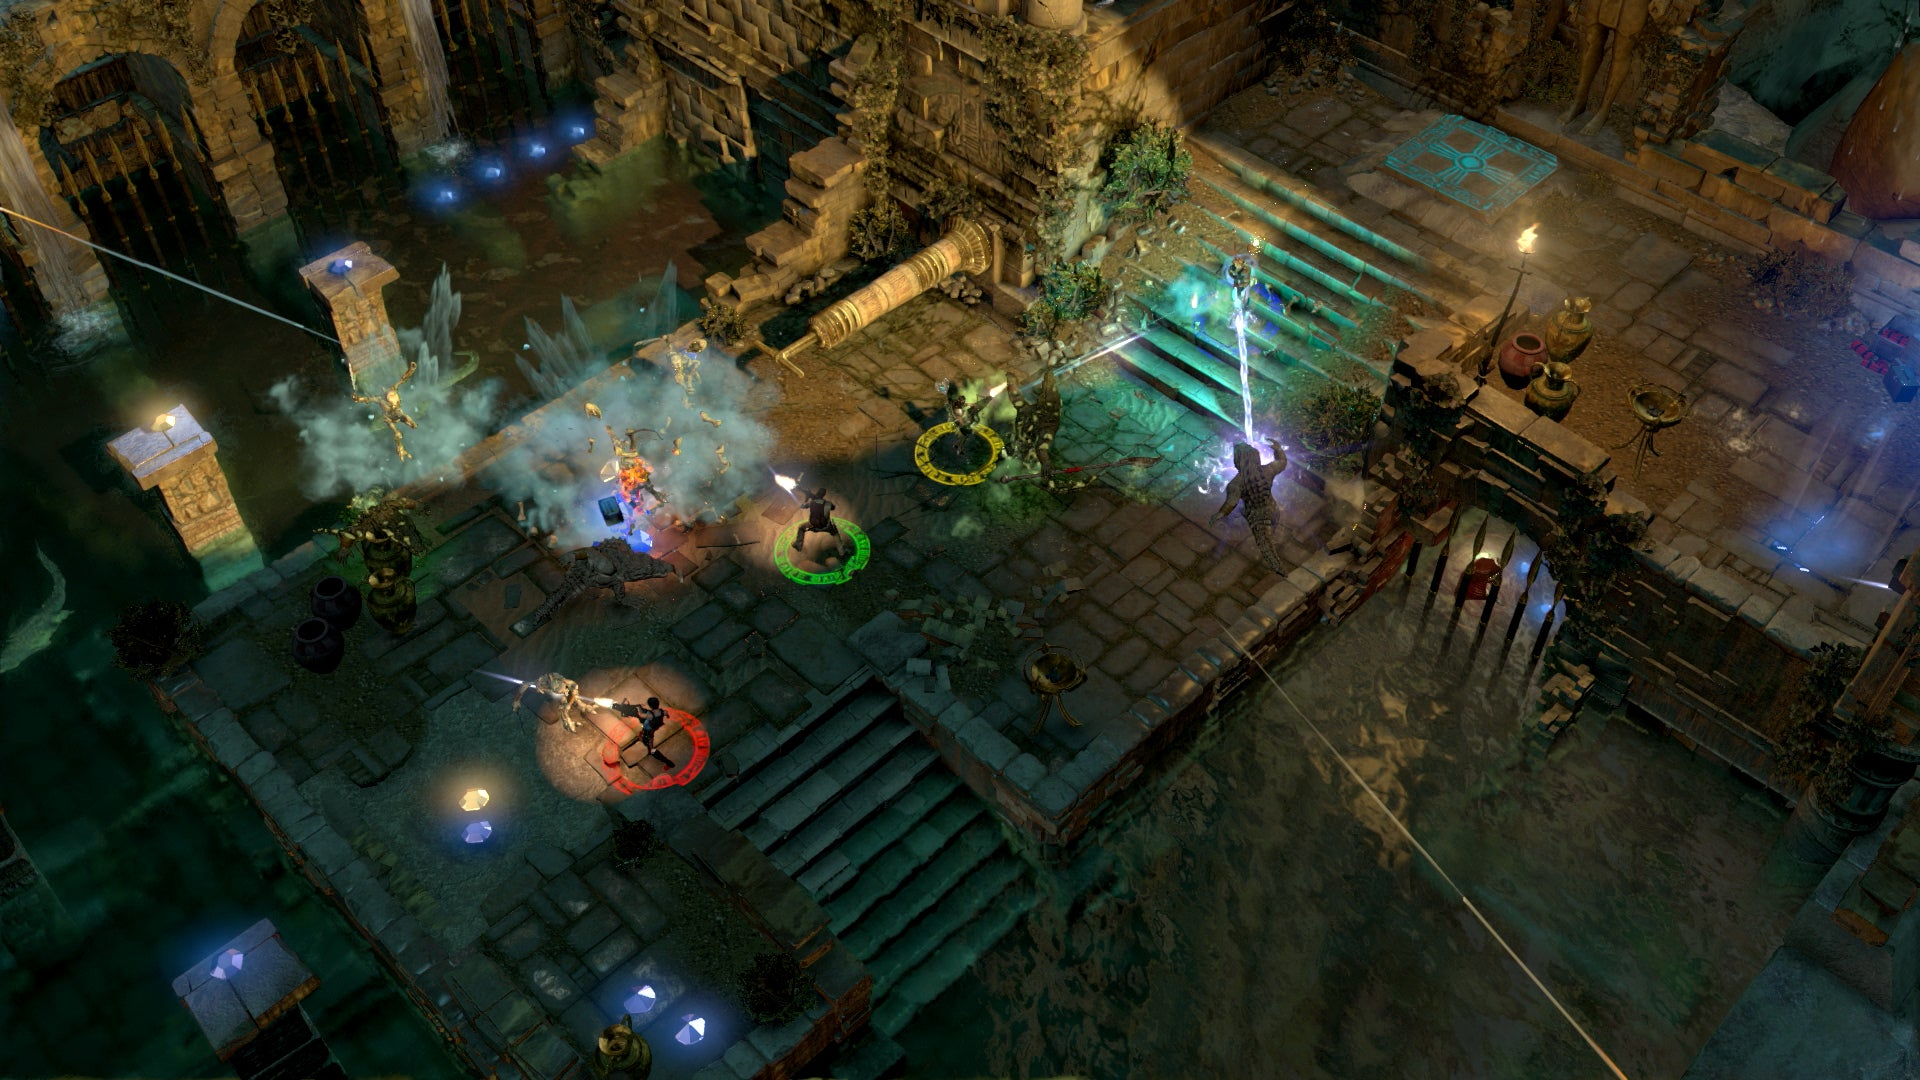 Lara Croft and the Temple of Osiris: The Kotaku Review